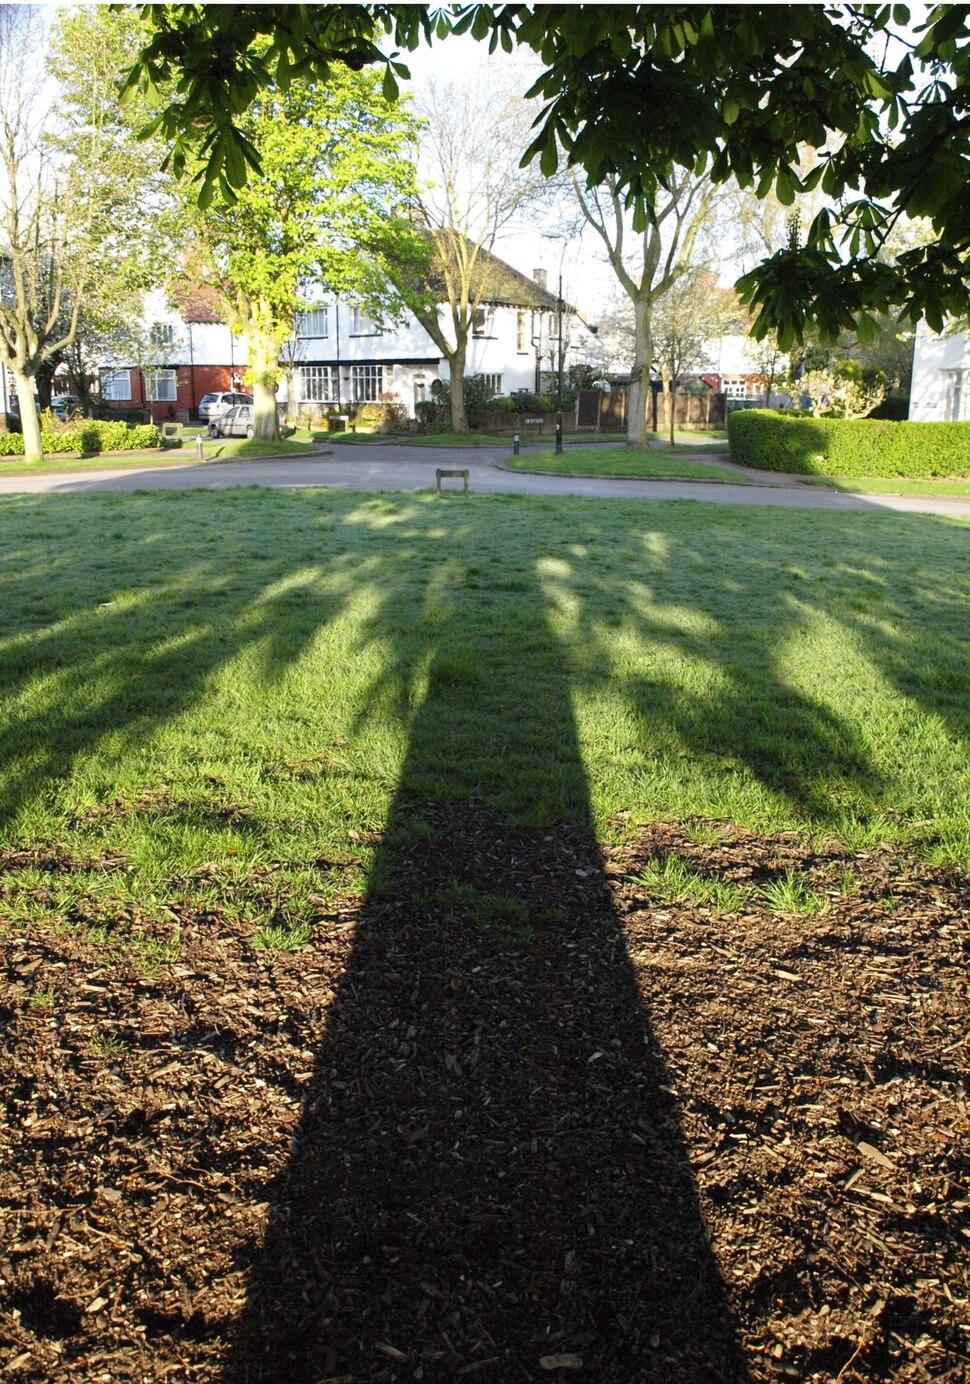 Tree shadow Chorltonville